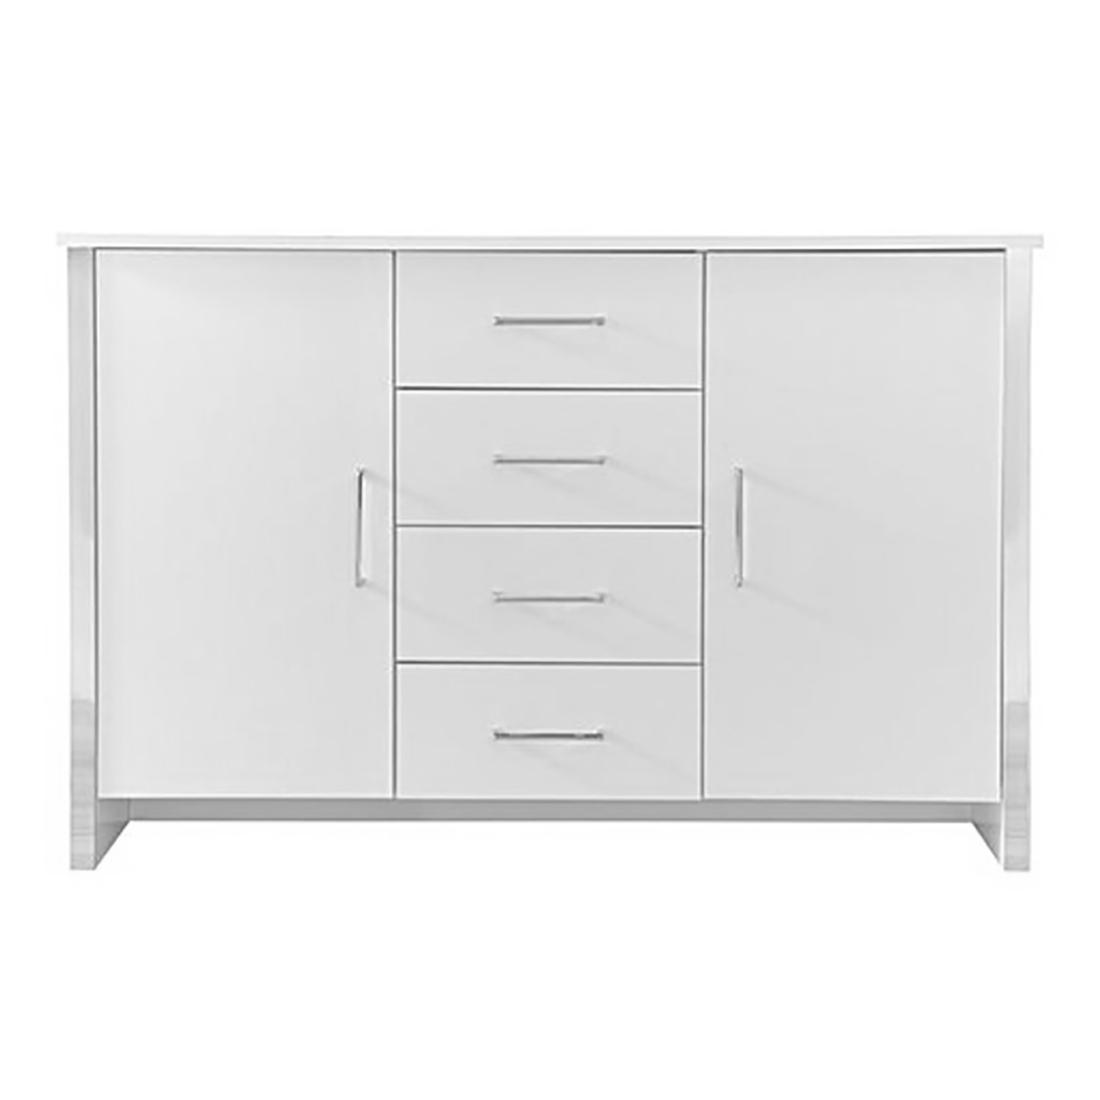 Gosport 2 Door / 4 Drawer Sideboard – White Ash — Online Throughout Recent Gosport Sideboards (Gallery 2 of 20)